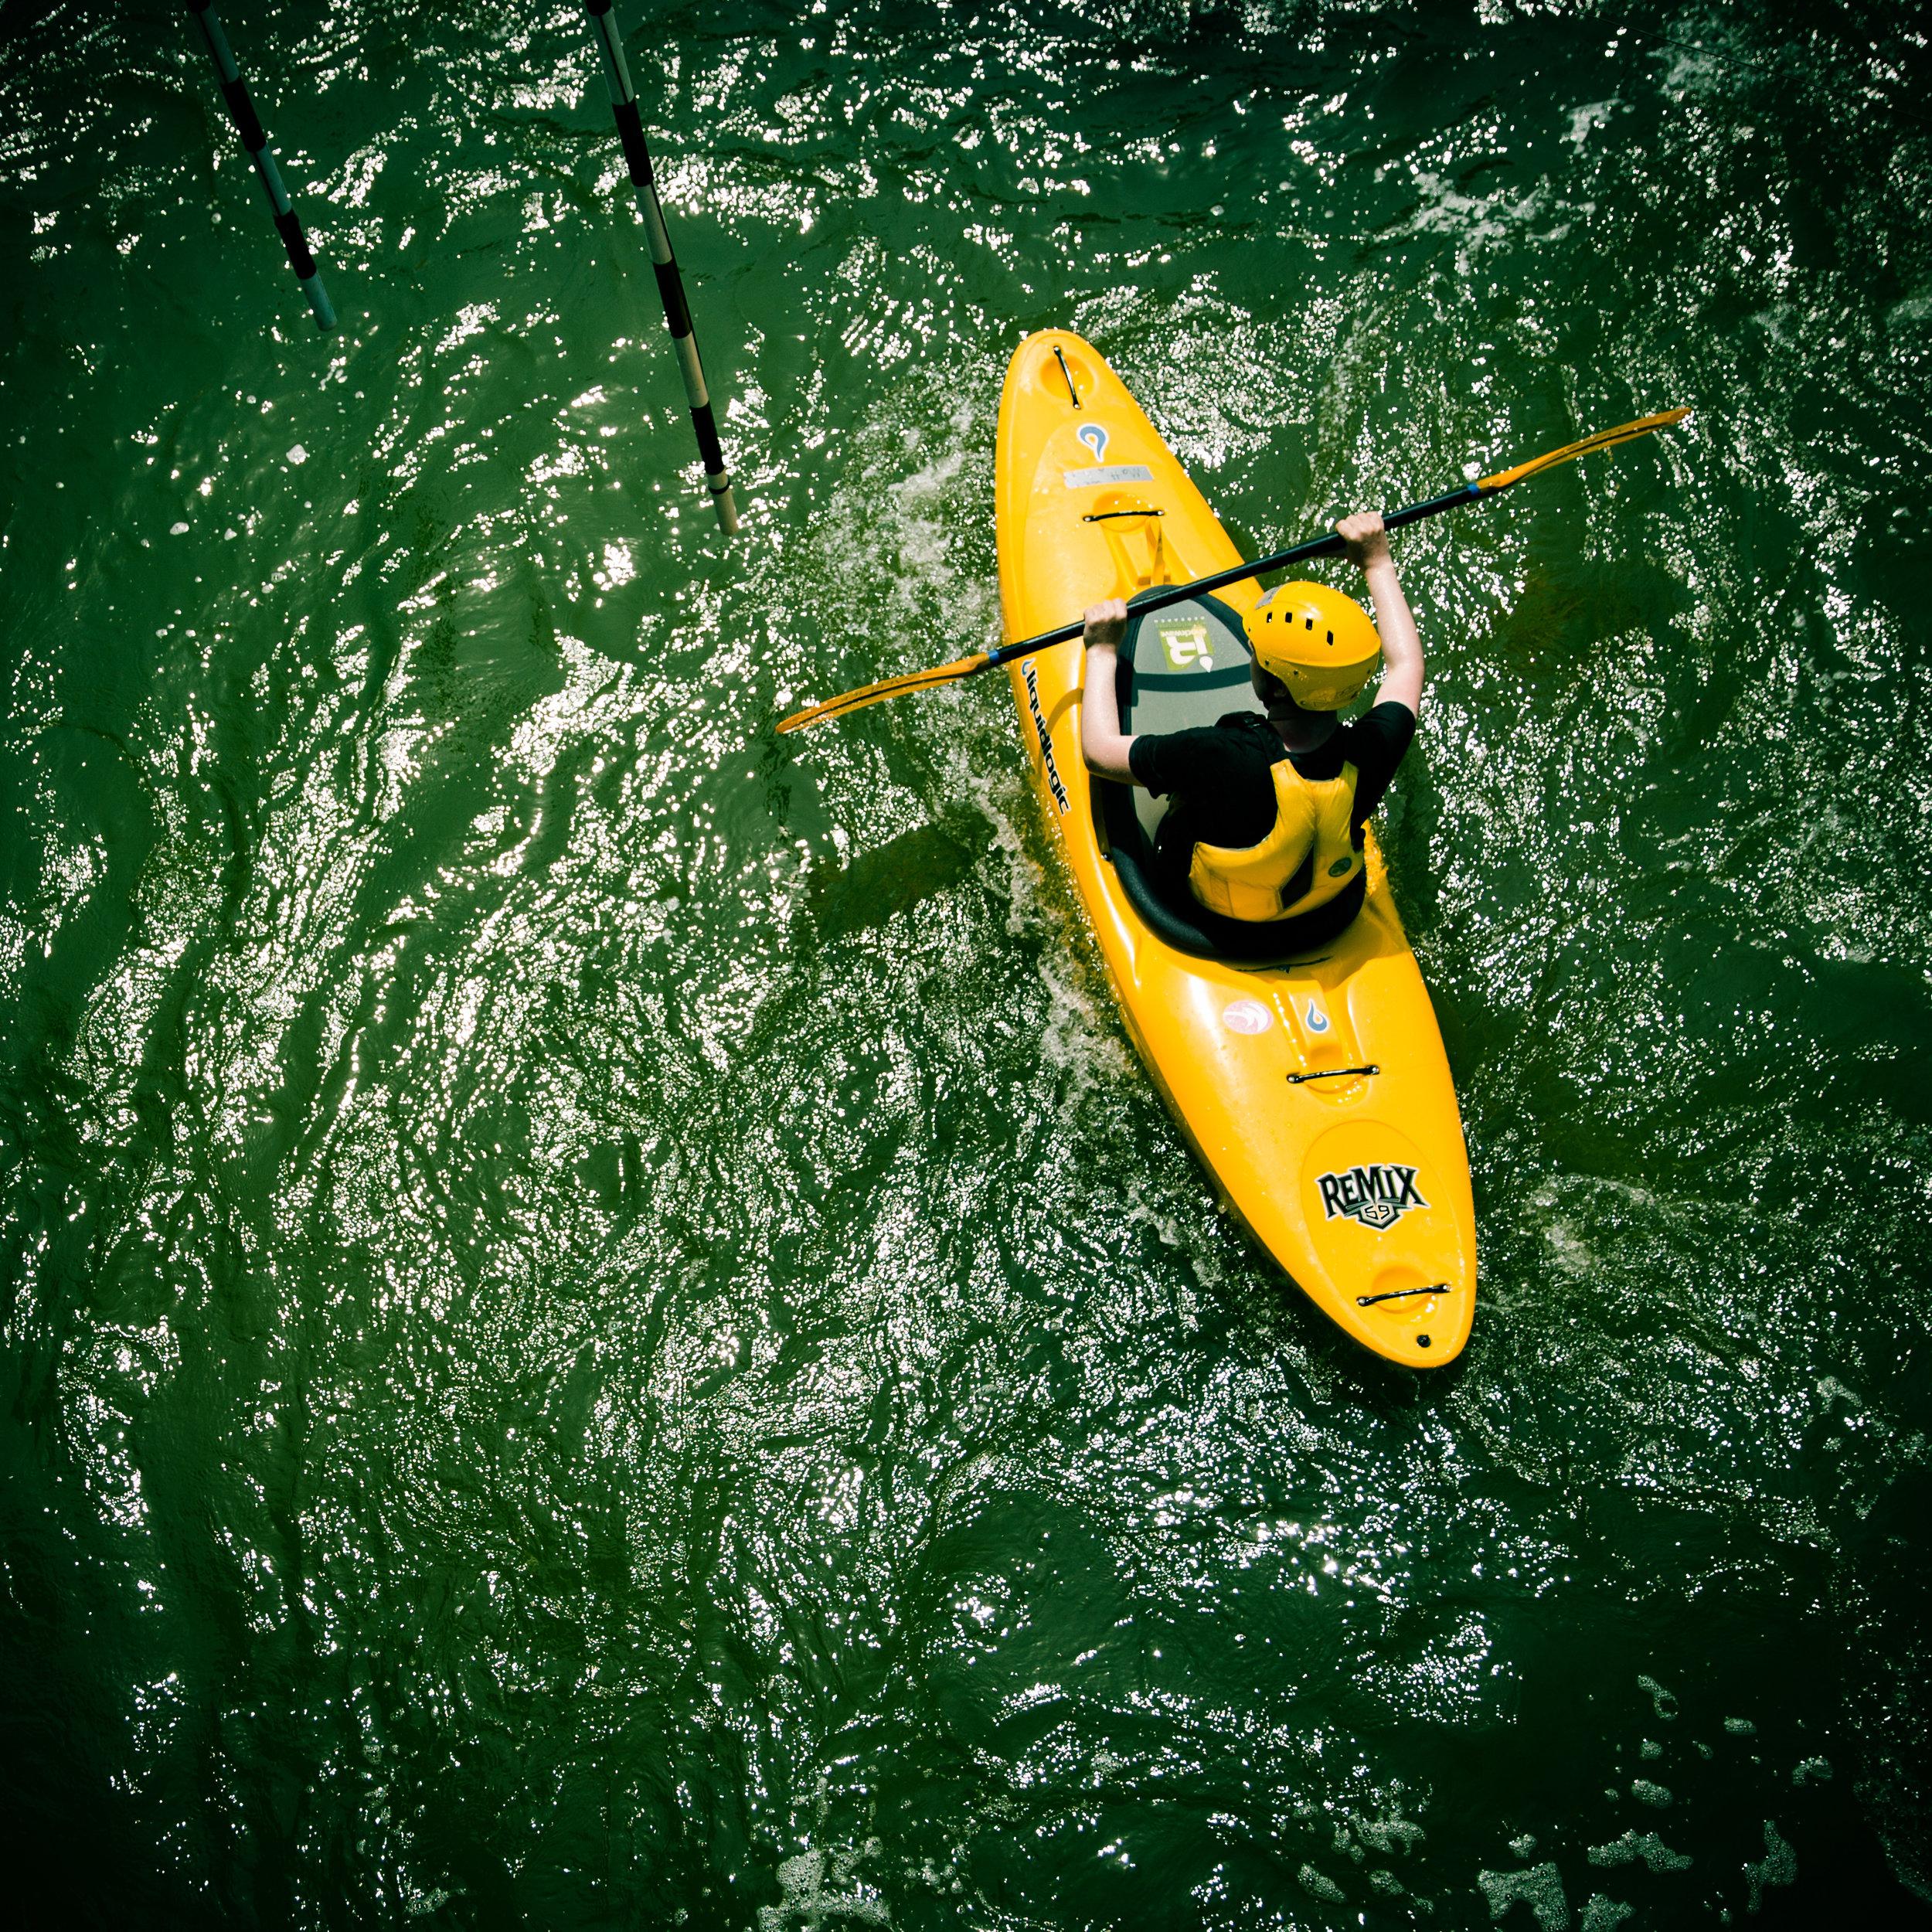 usnwc_rustywilliams_kayaker.jpg